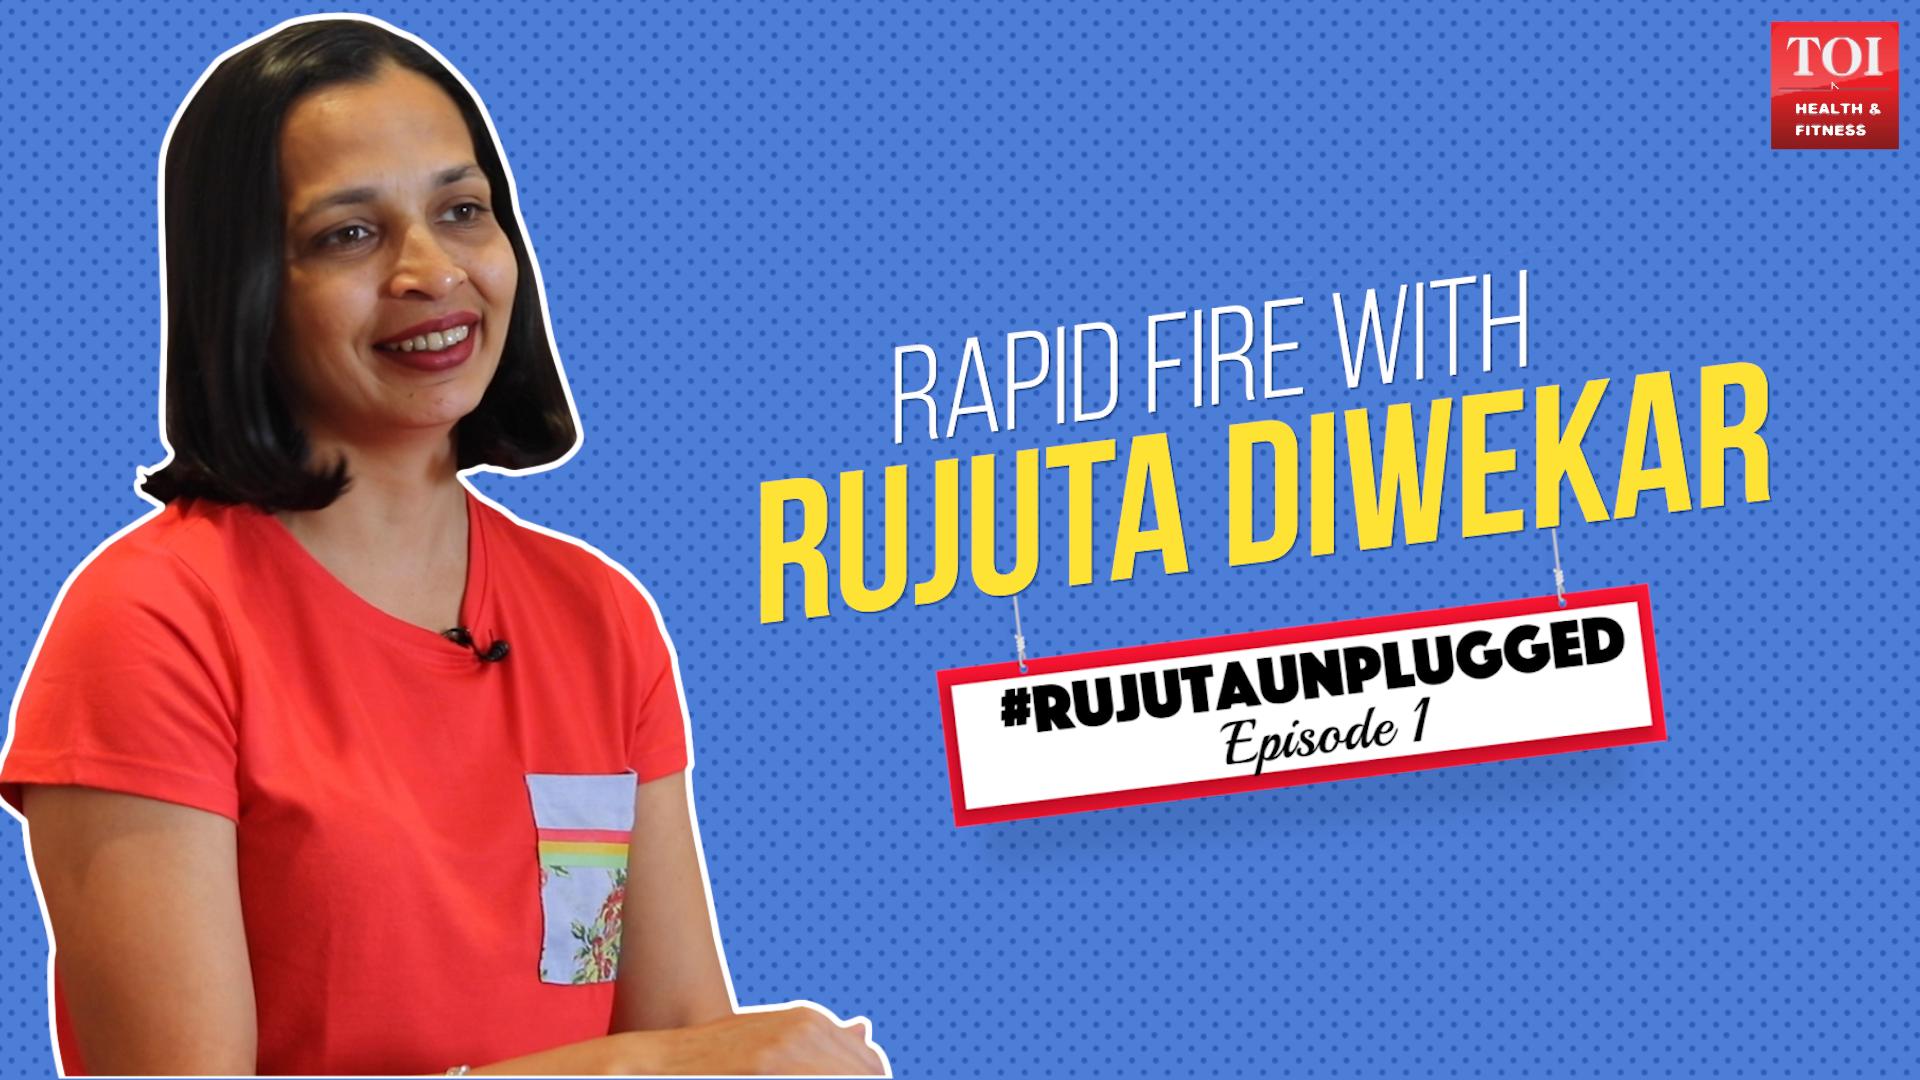 Watch: Rapid fire with Rujuta Diwekar